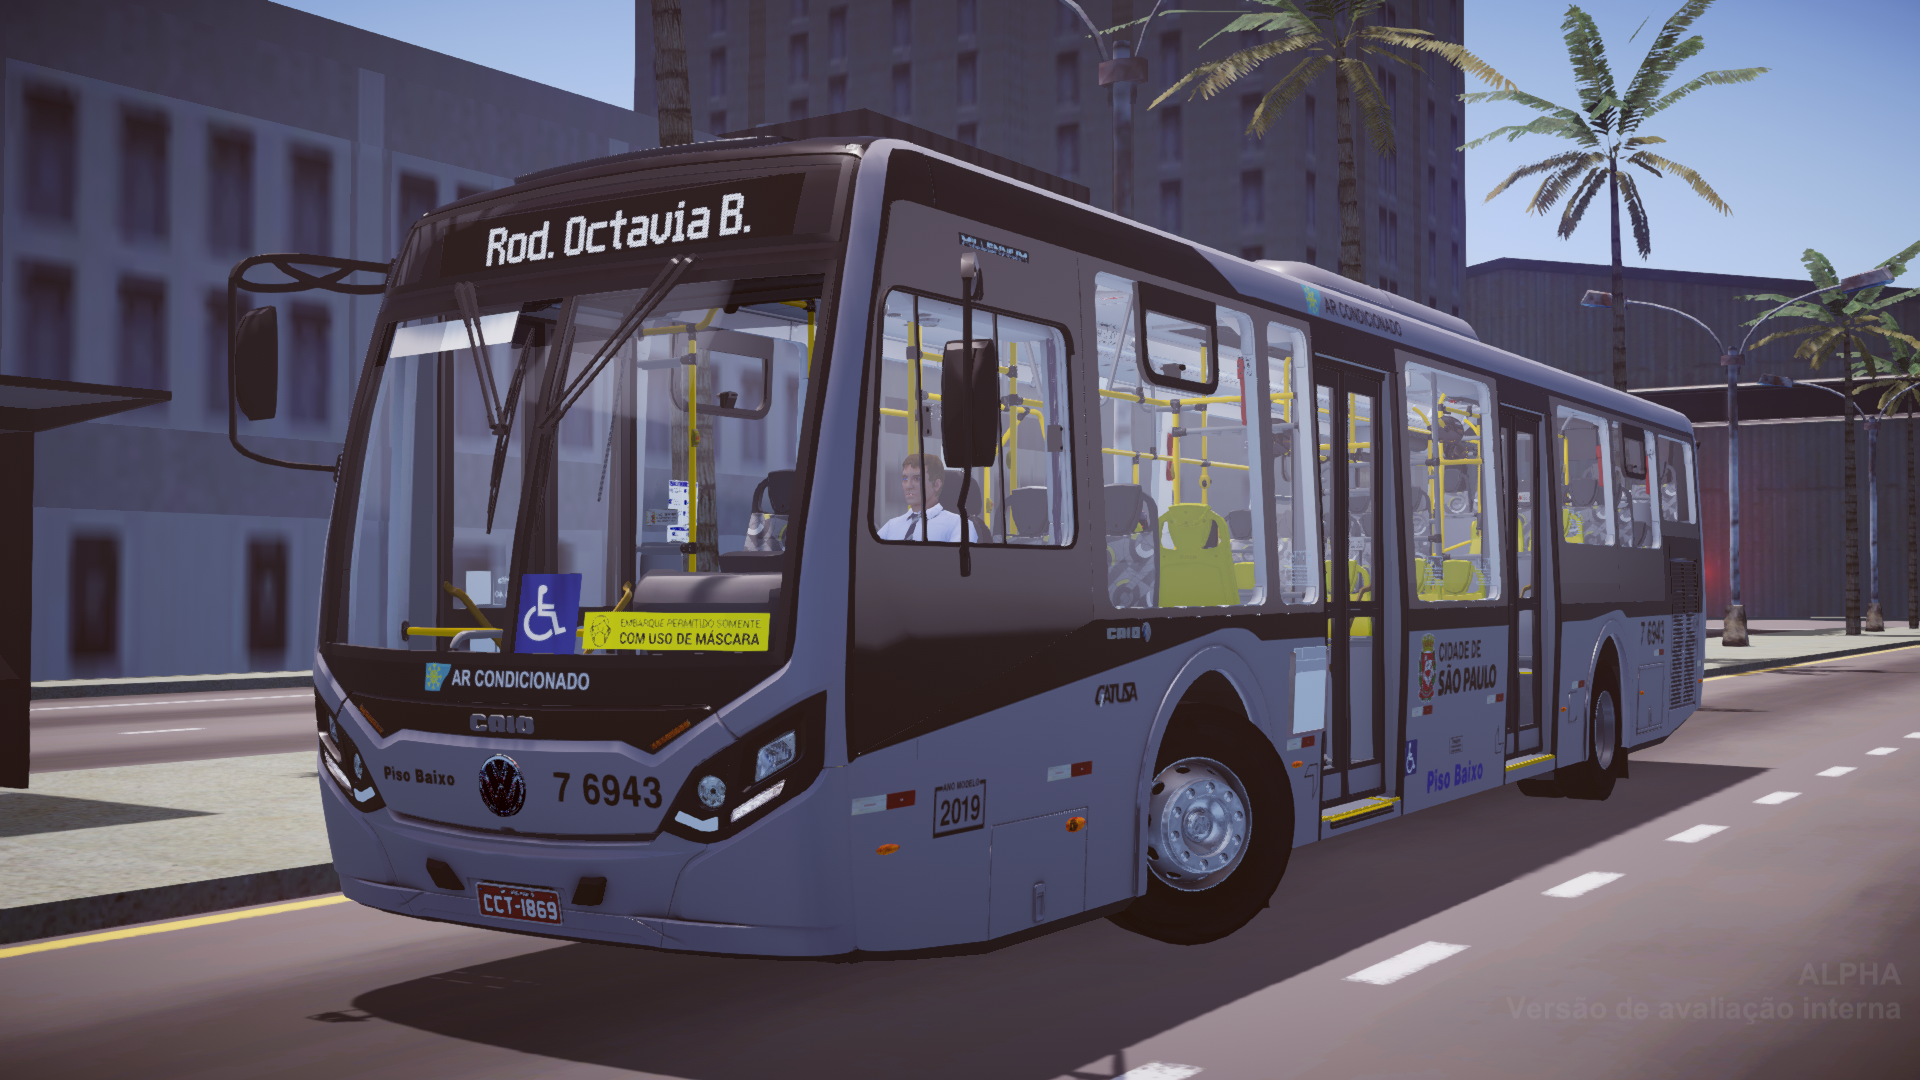 Caio Millennium IV VW 18.280 OTS LE – Padrão São Paulo (Fase 2) para Proton Bus Simulator/Road